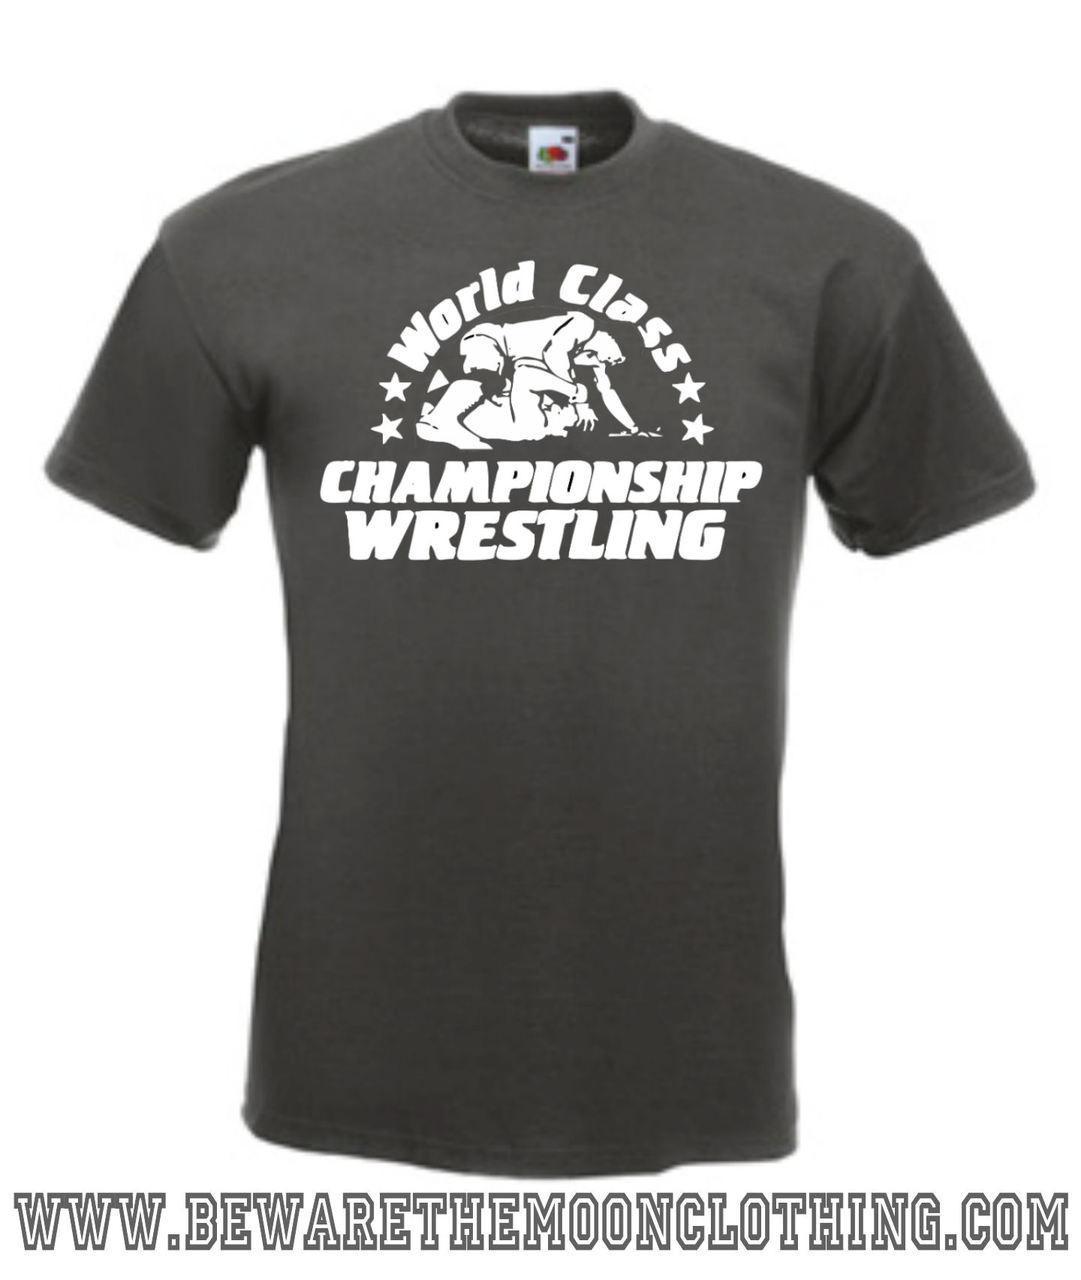 37f26b18 WCCW World Class Championship Wrestling T Shirt / Hoodie   Beware ...